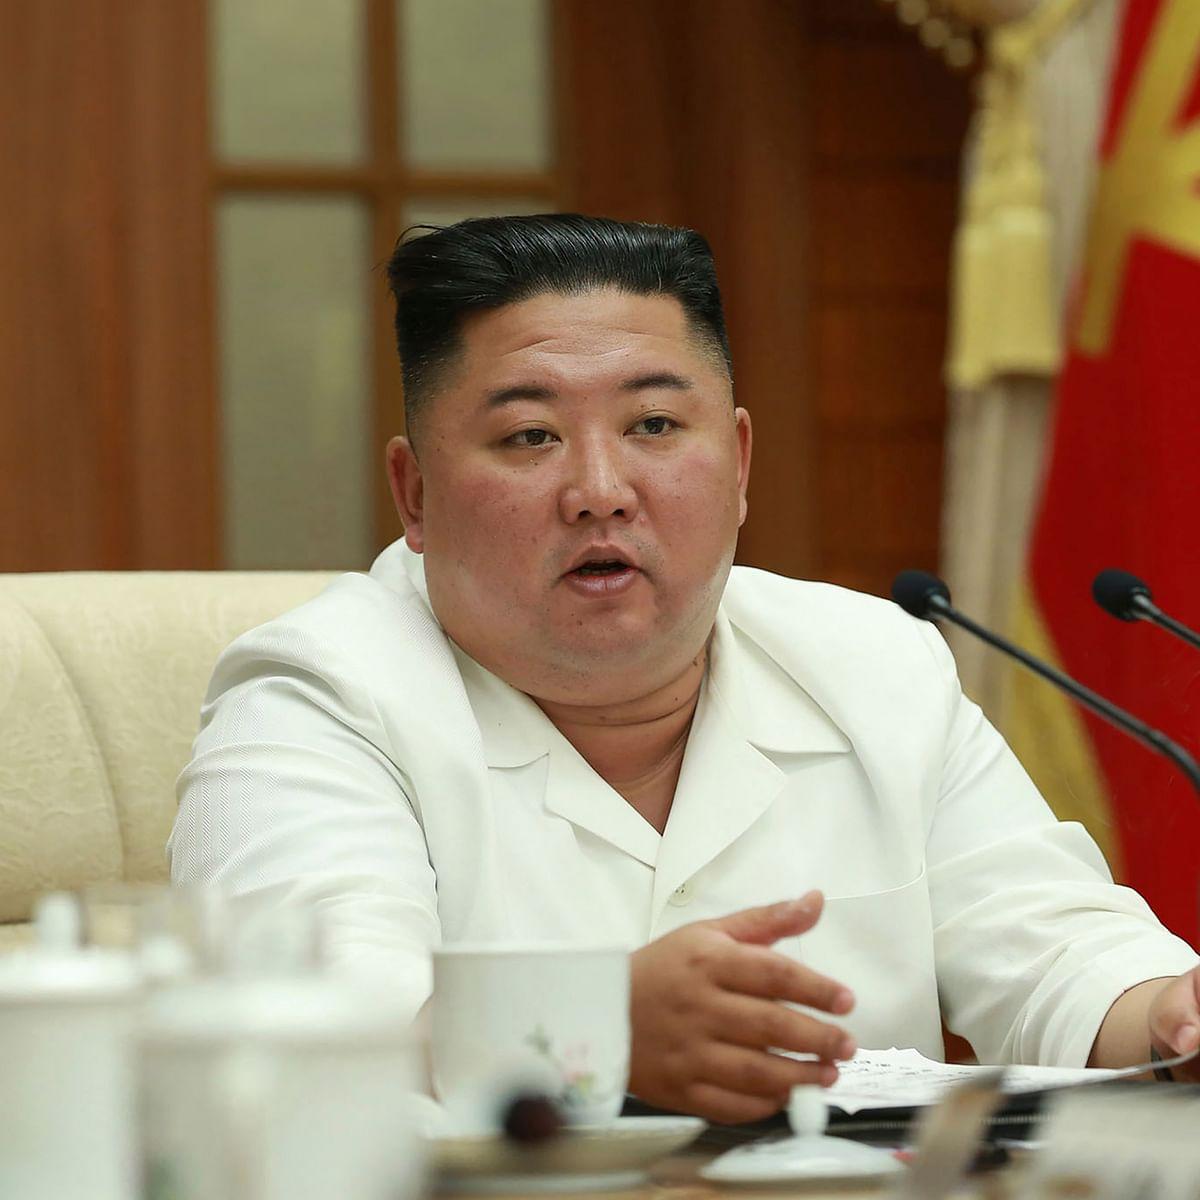 Not one North Korean fell victim to COVID-19, says Kim Jong-un